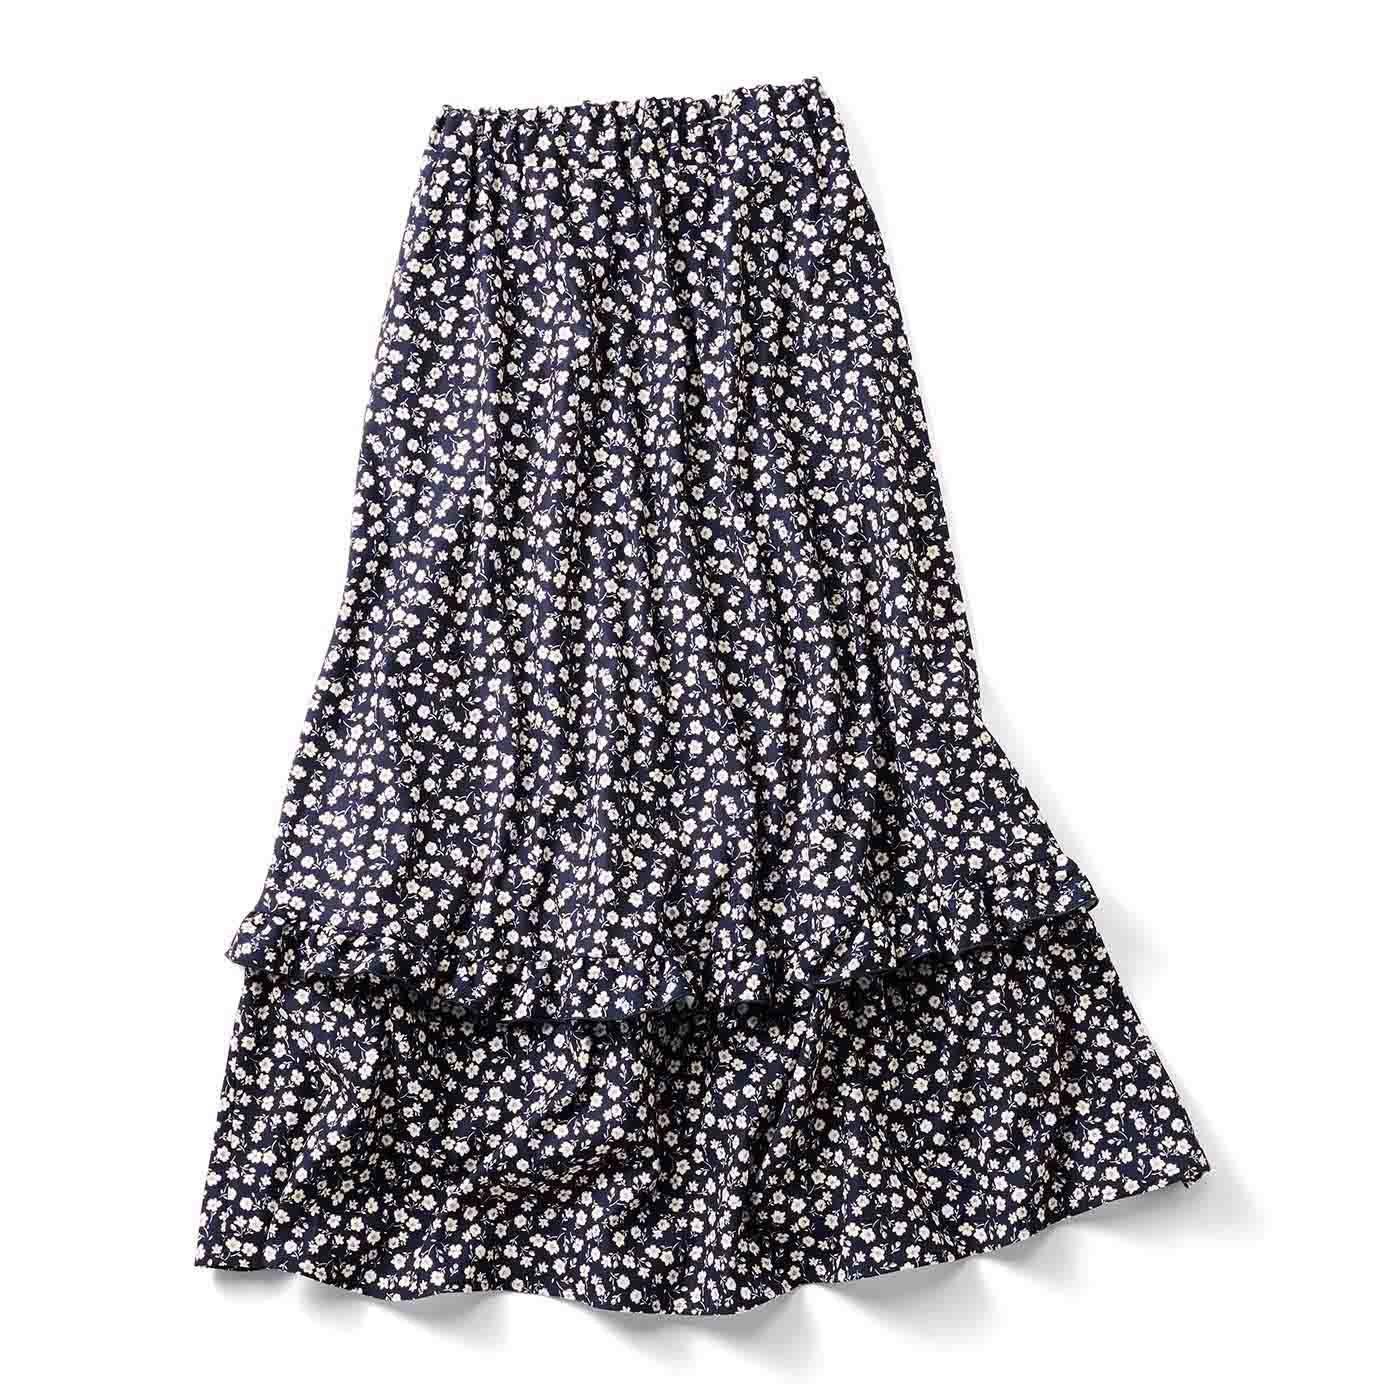 IEDIT[イディット] シャギーカットソー裏地付きのあったかプリントロングスカート〈ネイビー〉